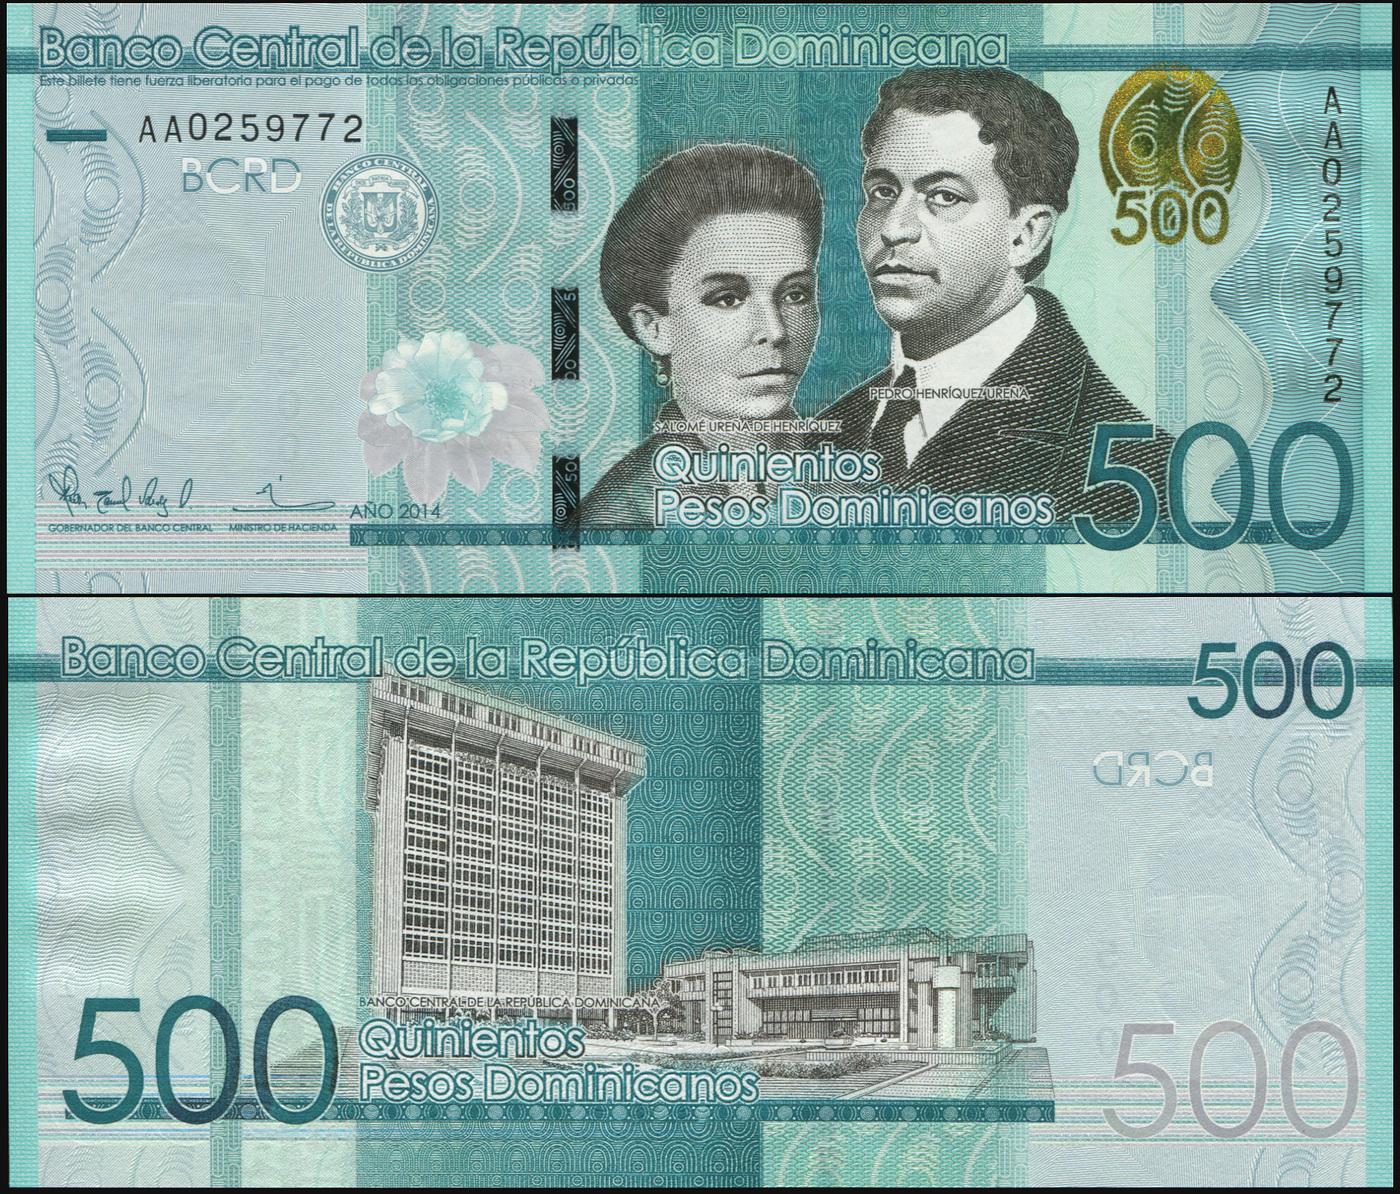 Банкнота. Доминиканская республика 500 песо доминикано. 2014 UNC. Кат.P.192a